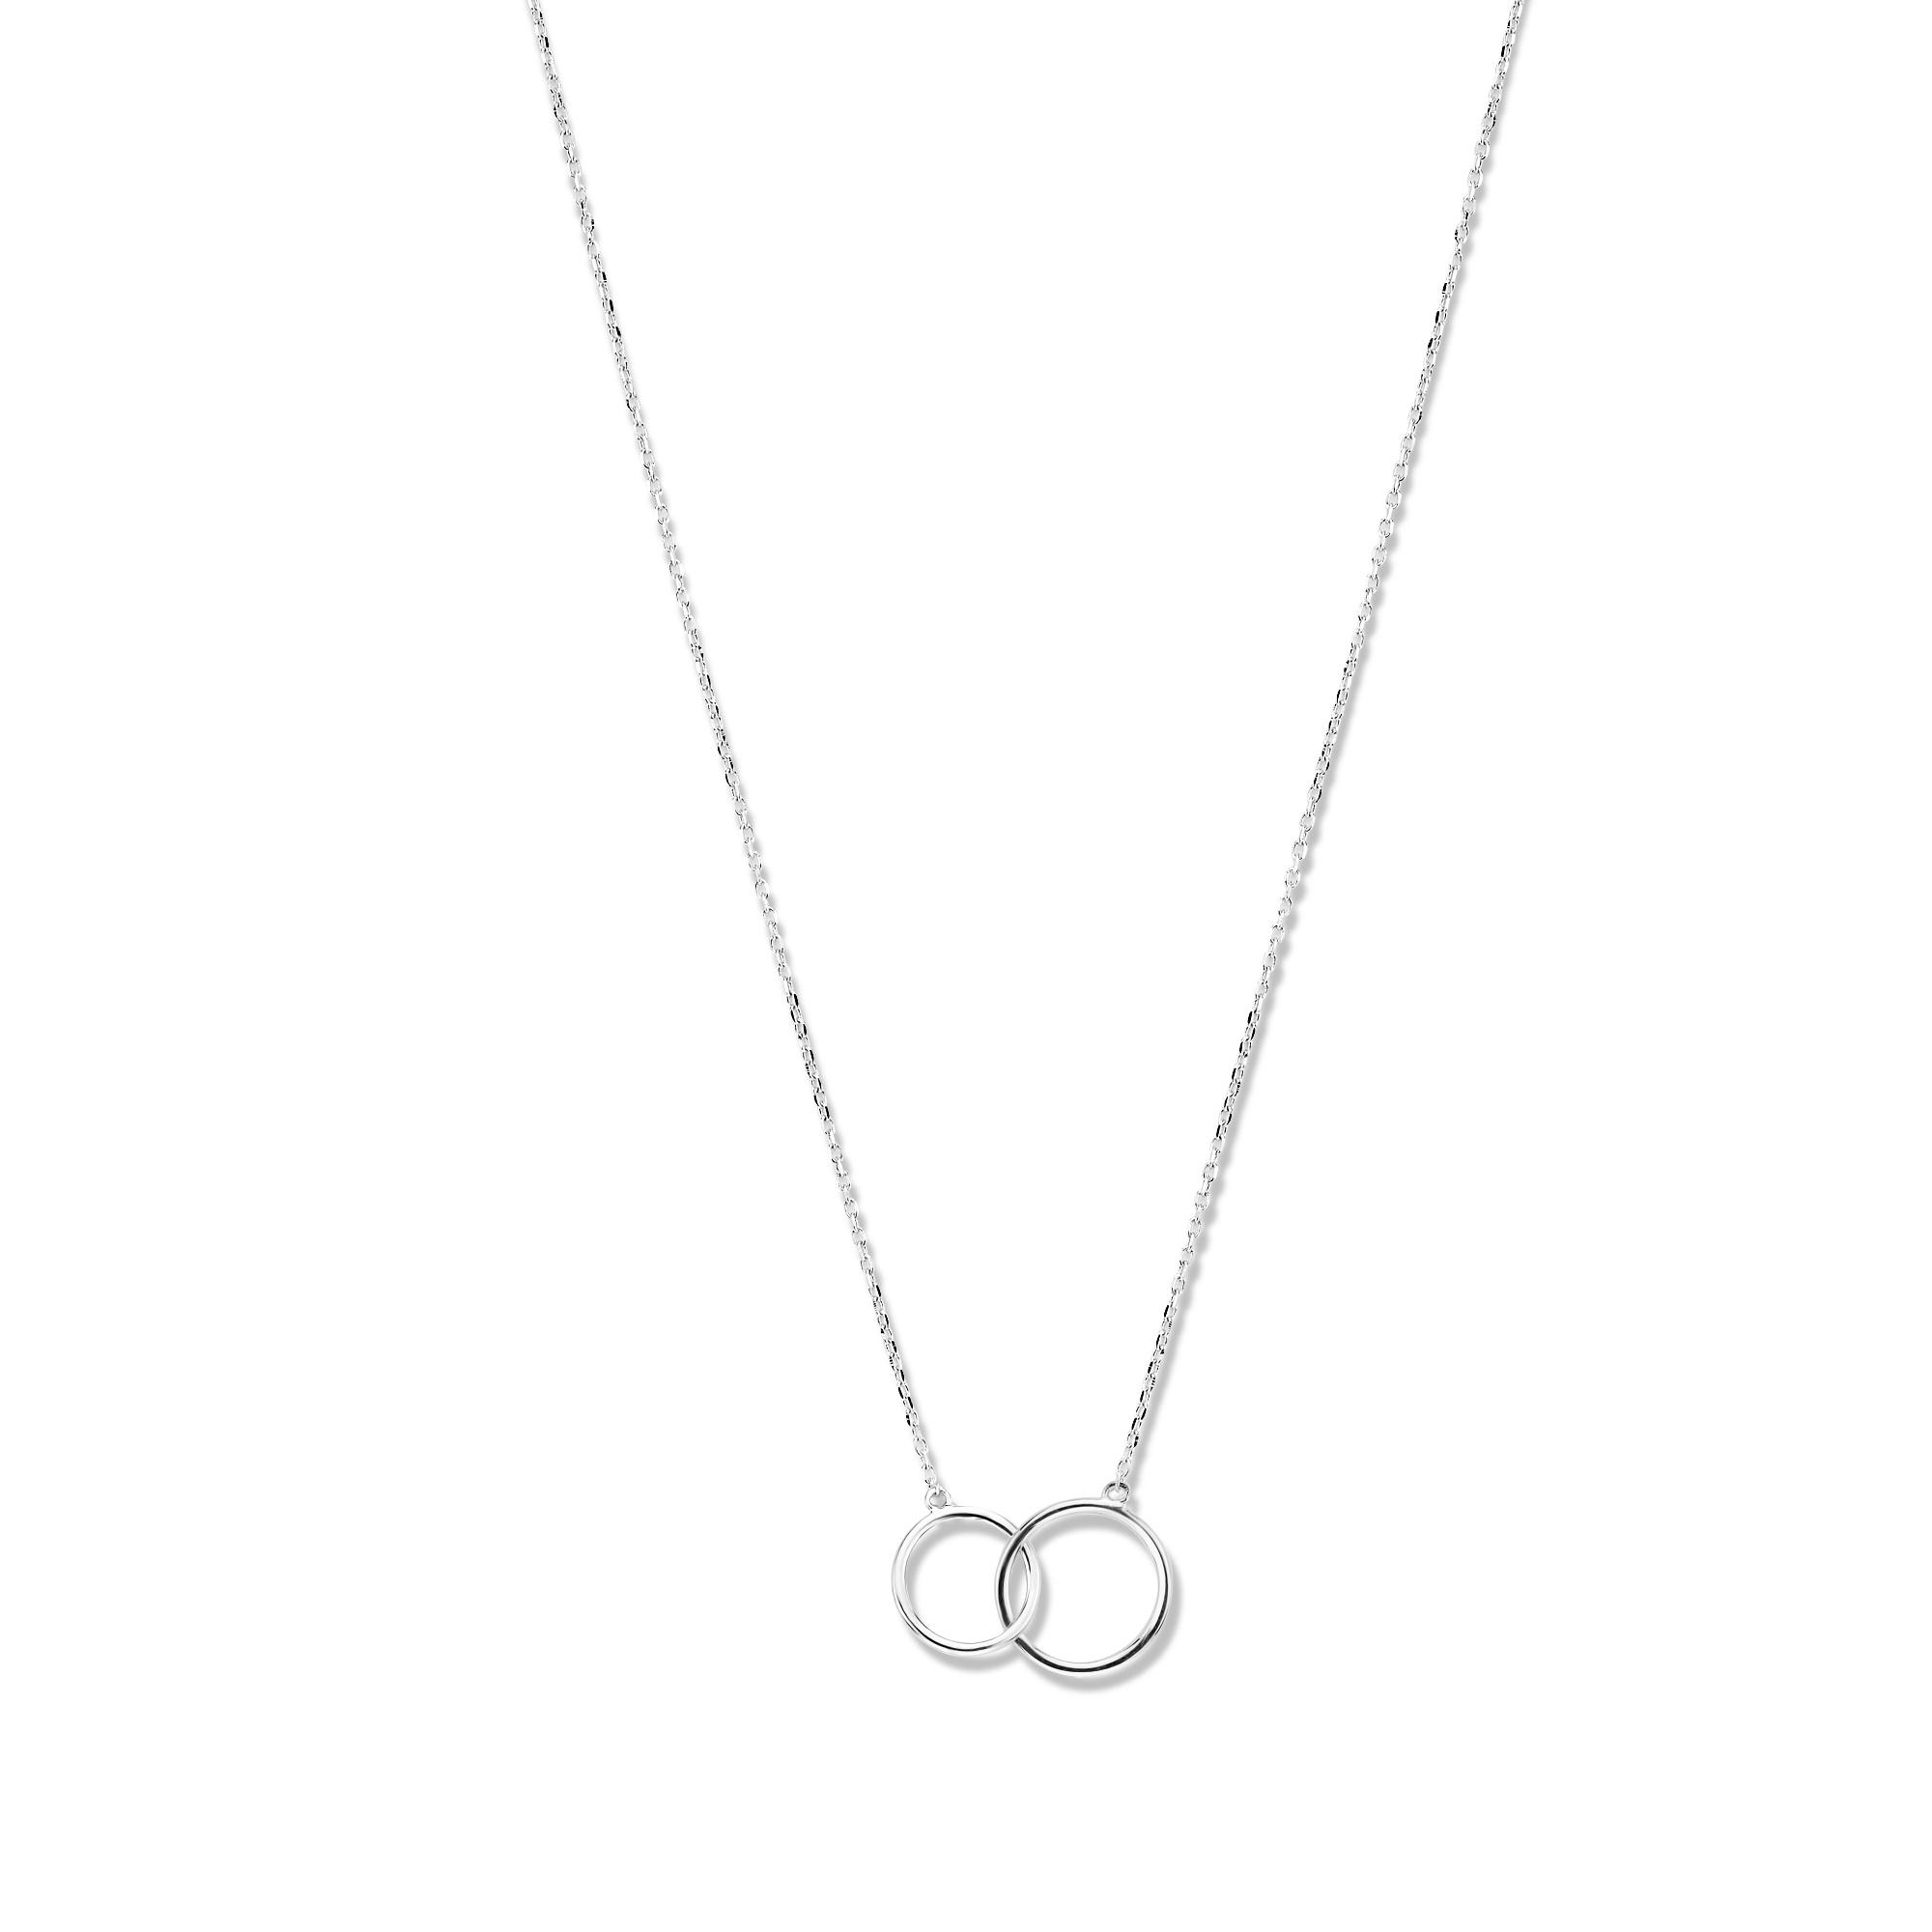 Isabel Bernard Saint Germain Loulou collier en or blanc 14 carats